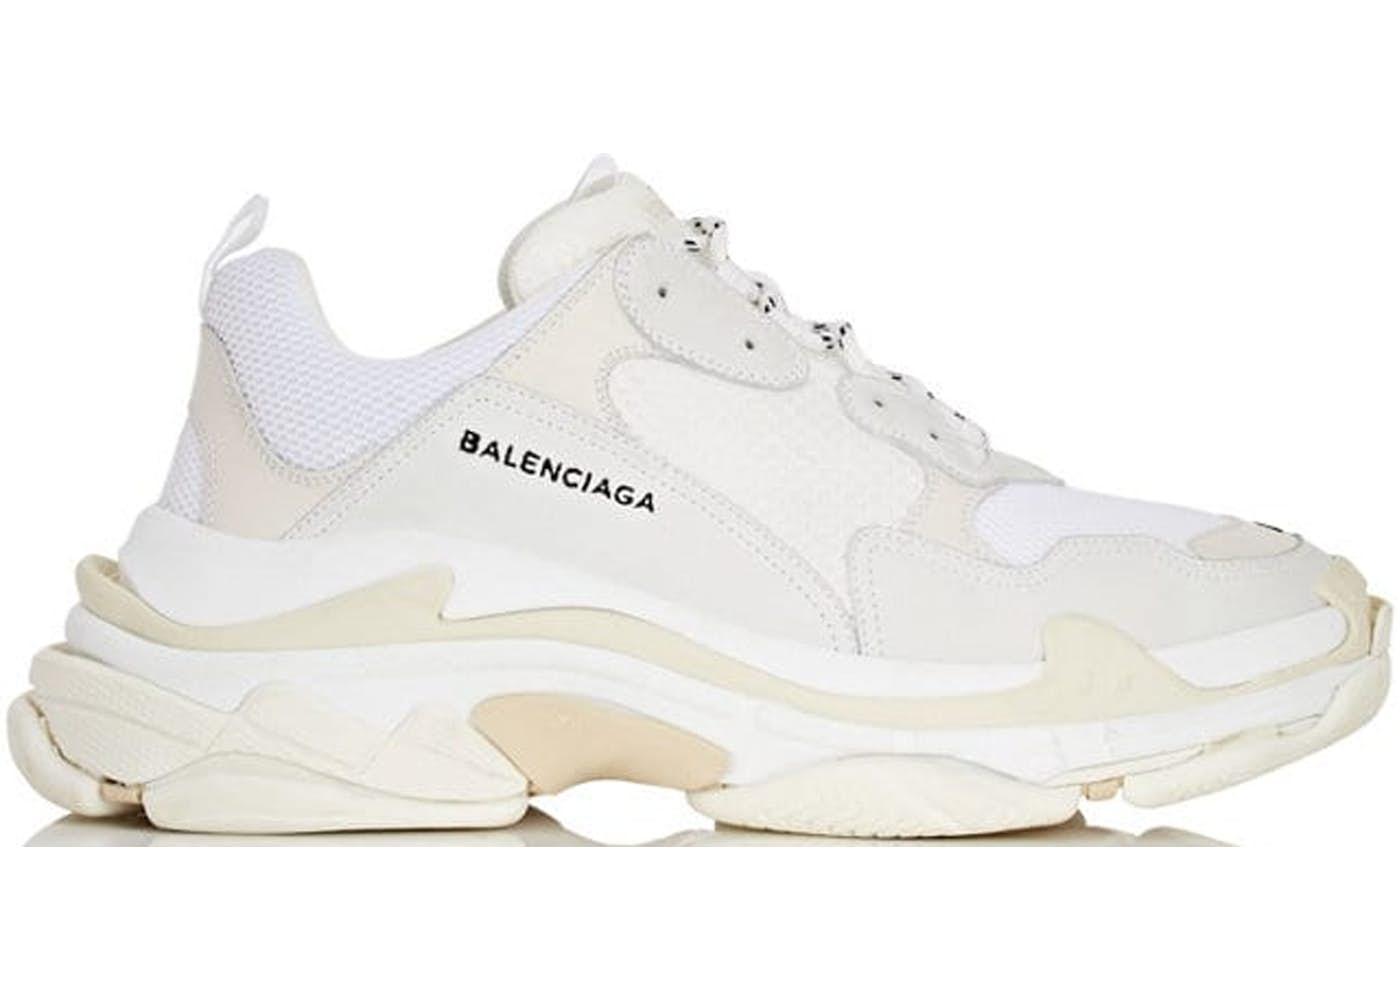 Balenciaga Shoe Size Fit